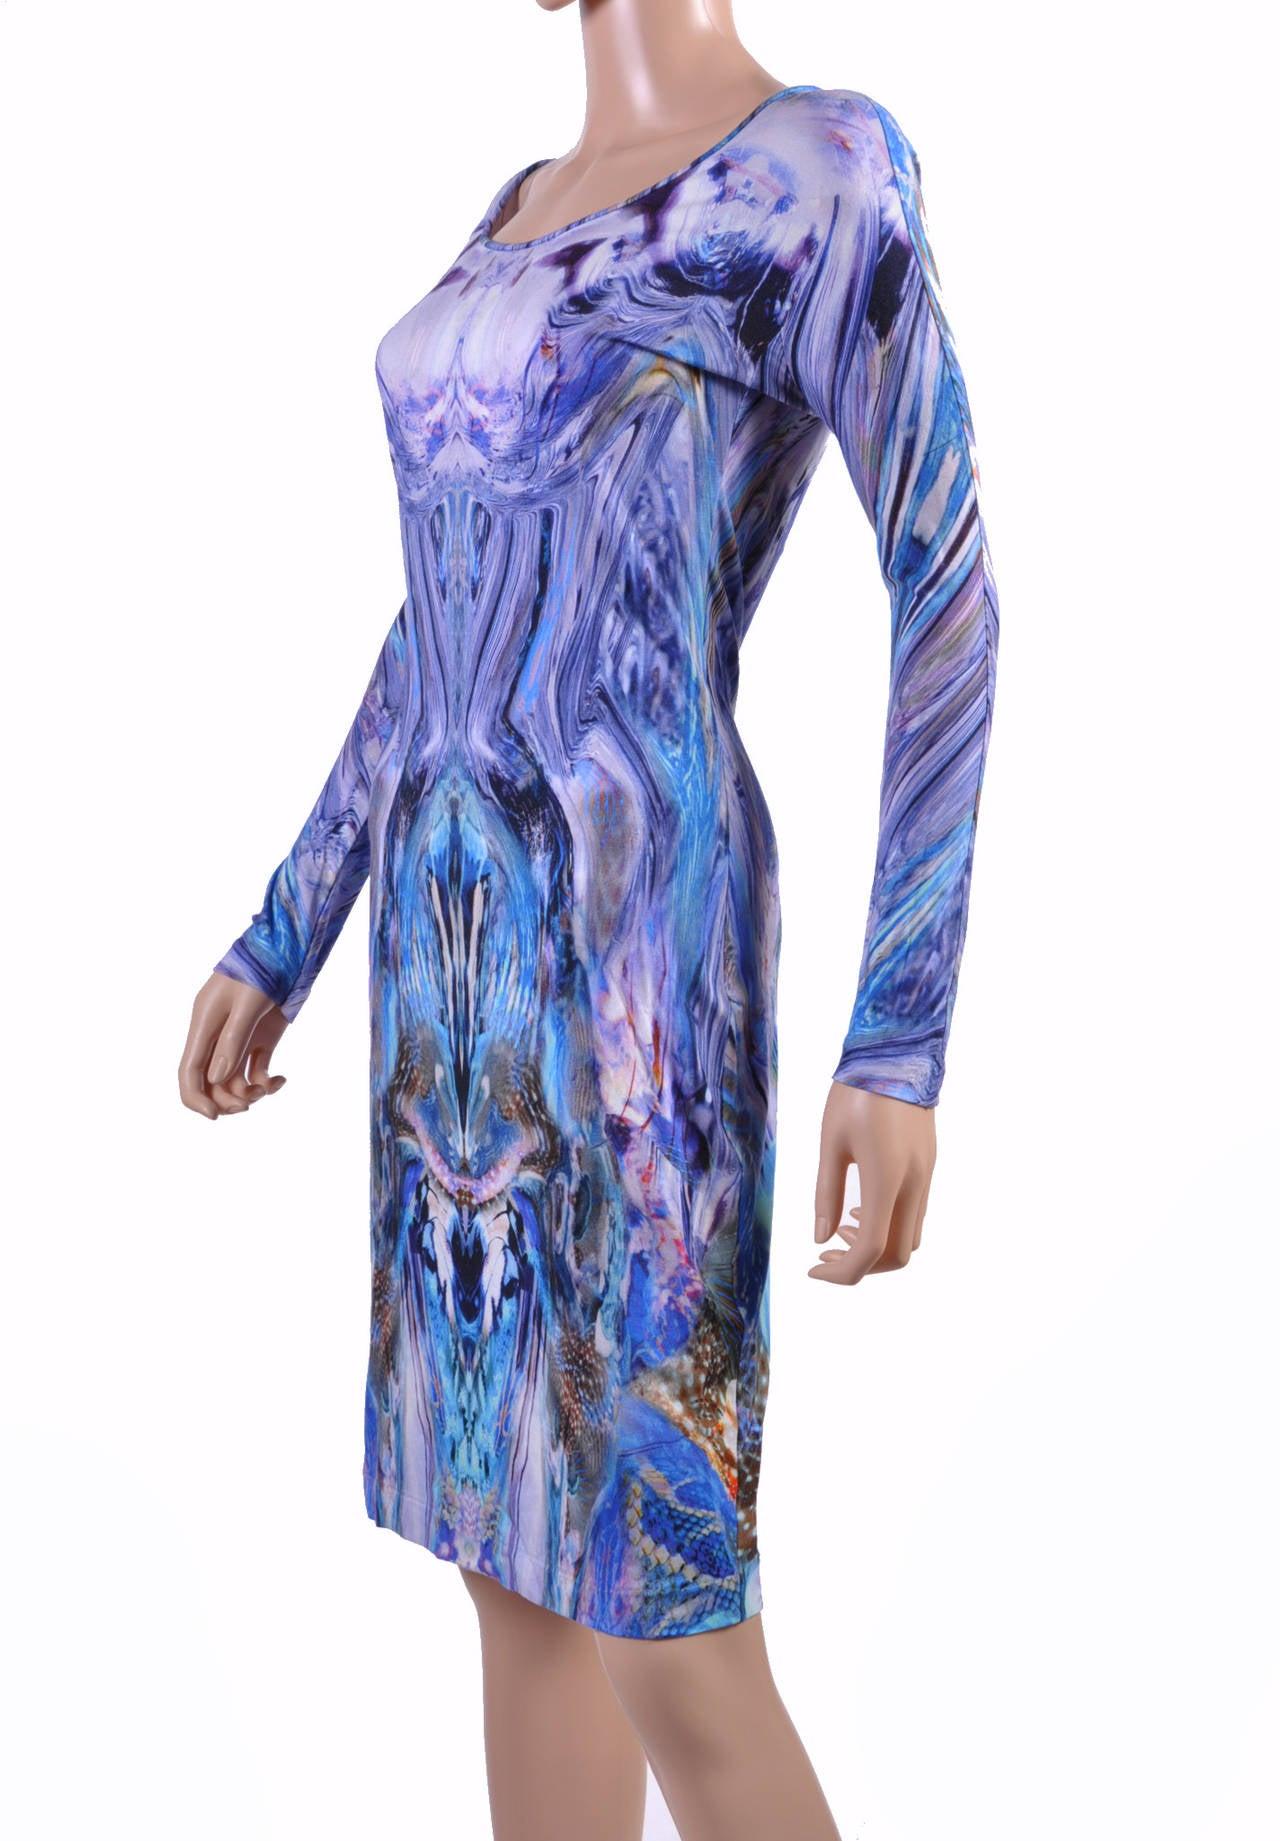 ICONIC ALEXANDER MсQUEEN  DRESS  2010 Plato Atlantis Collection  94% Viscose, 6% Elastane  IT Size 38       Excellent condition